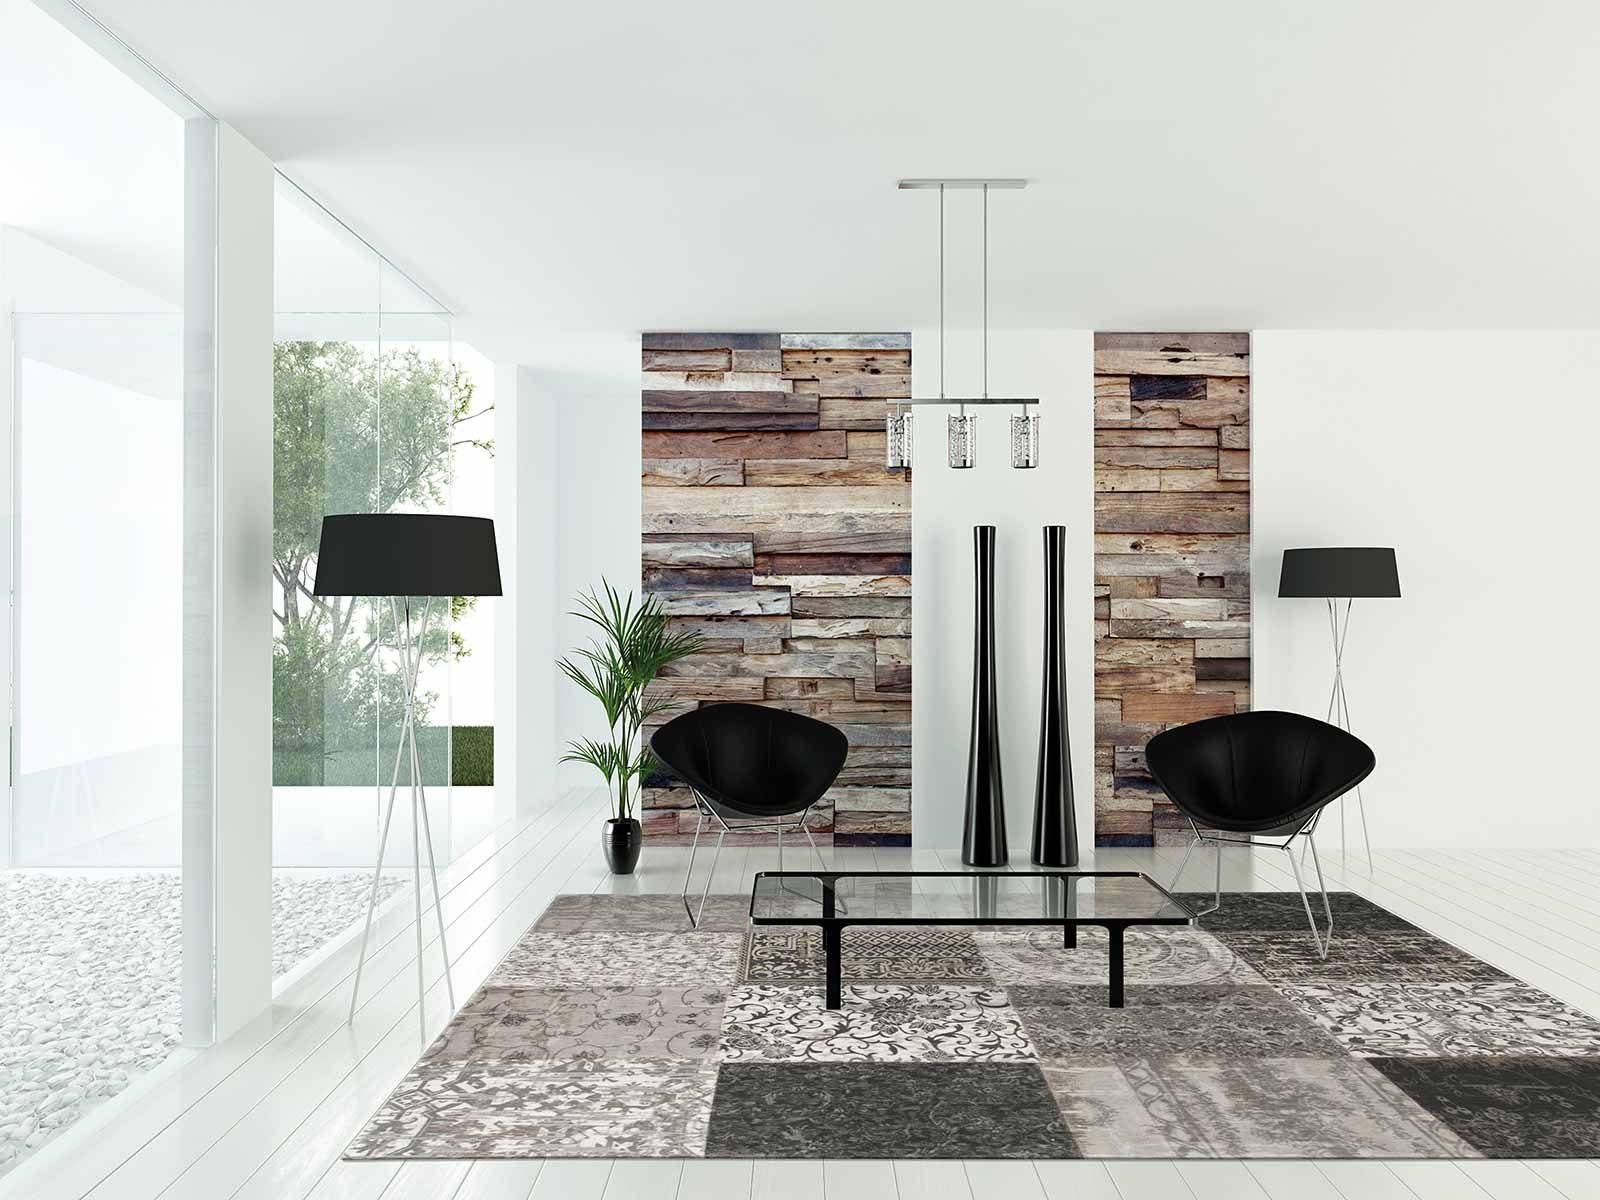 alfombras Louis De Poortere LX8101 Vintage Black White interior 2